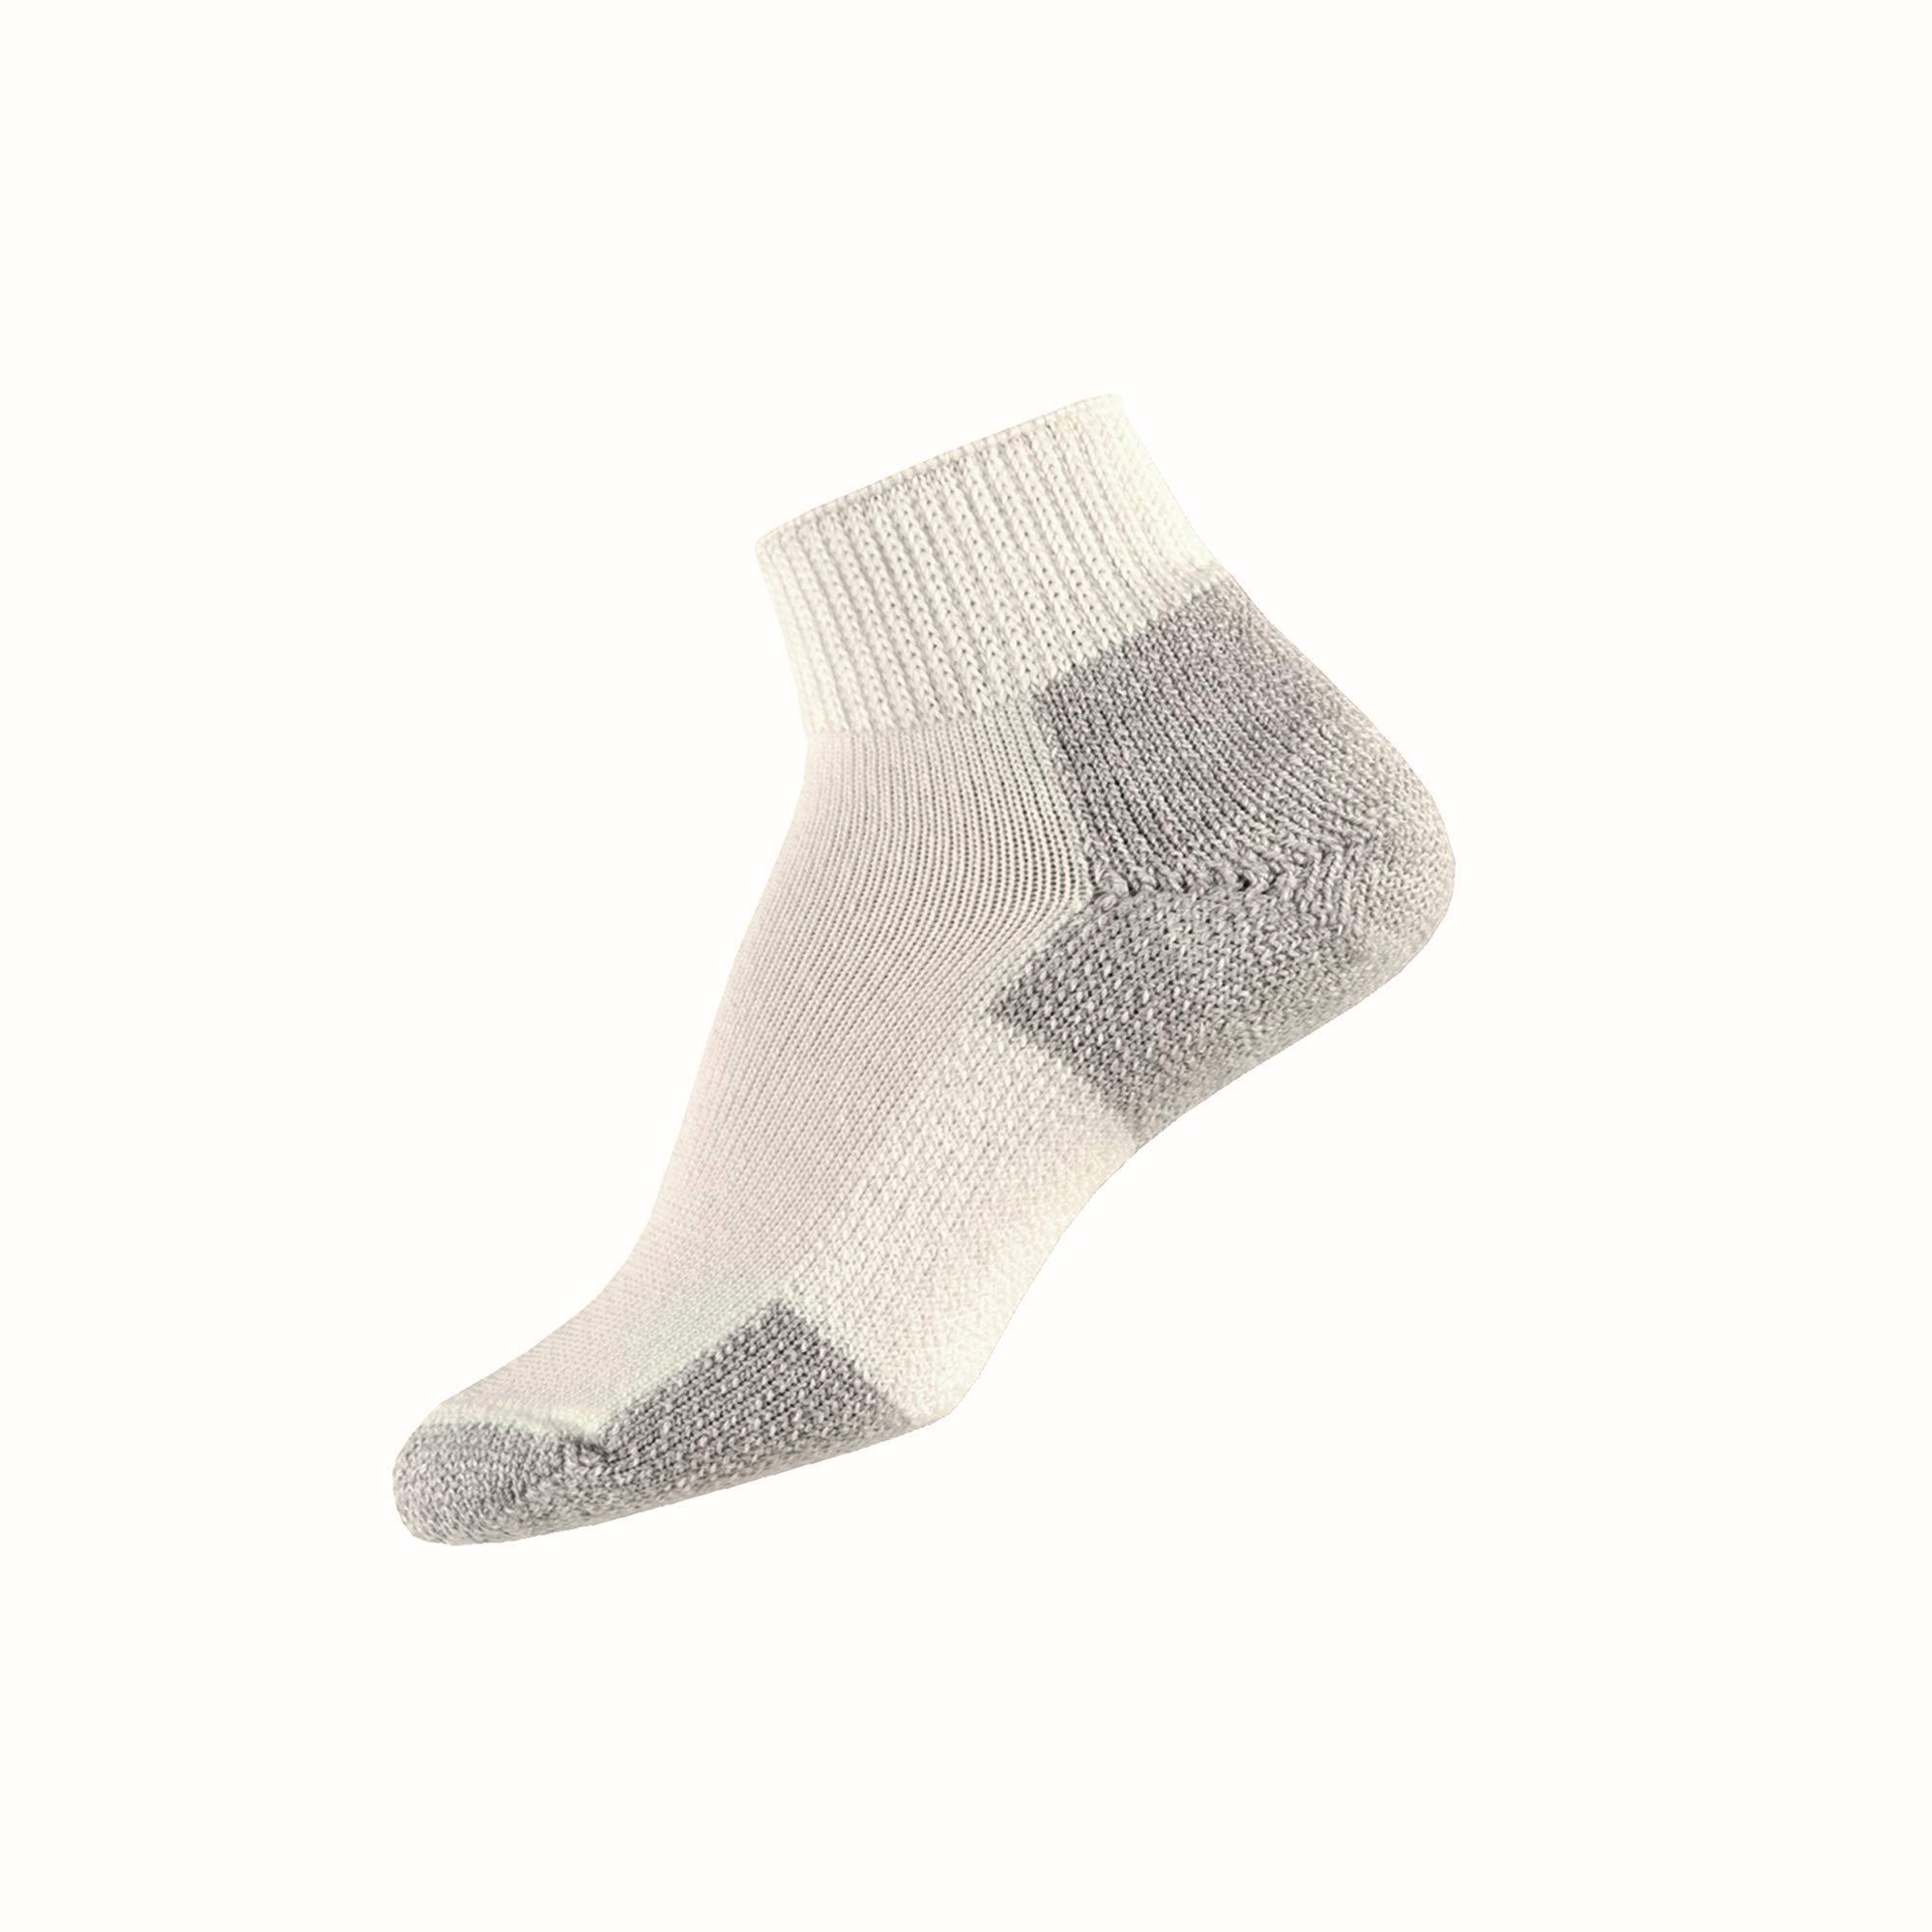 Thorlos Unisex JMX Running Thick Padded Ankle Sock, White, Medium by thorlos